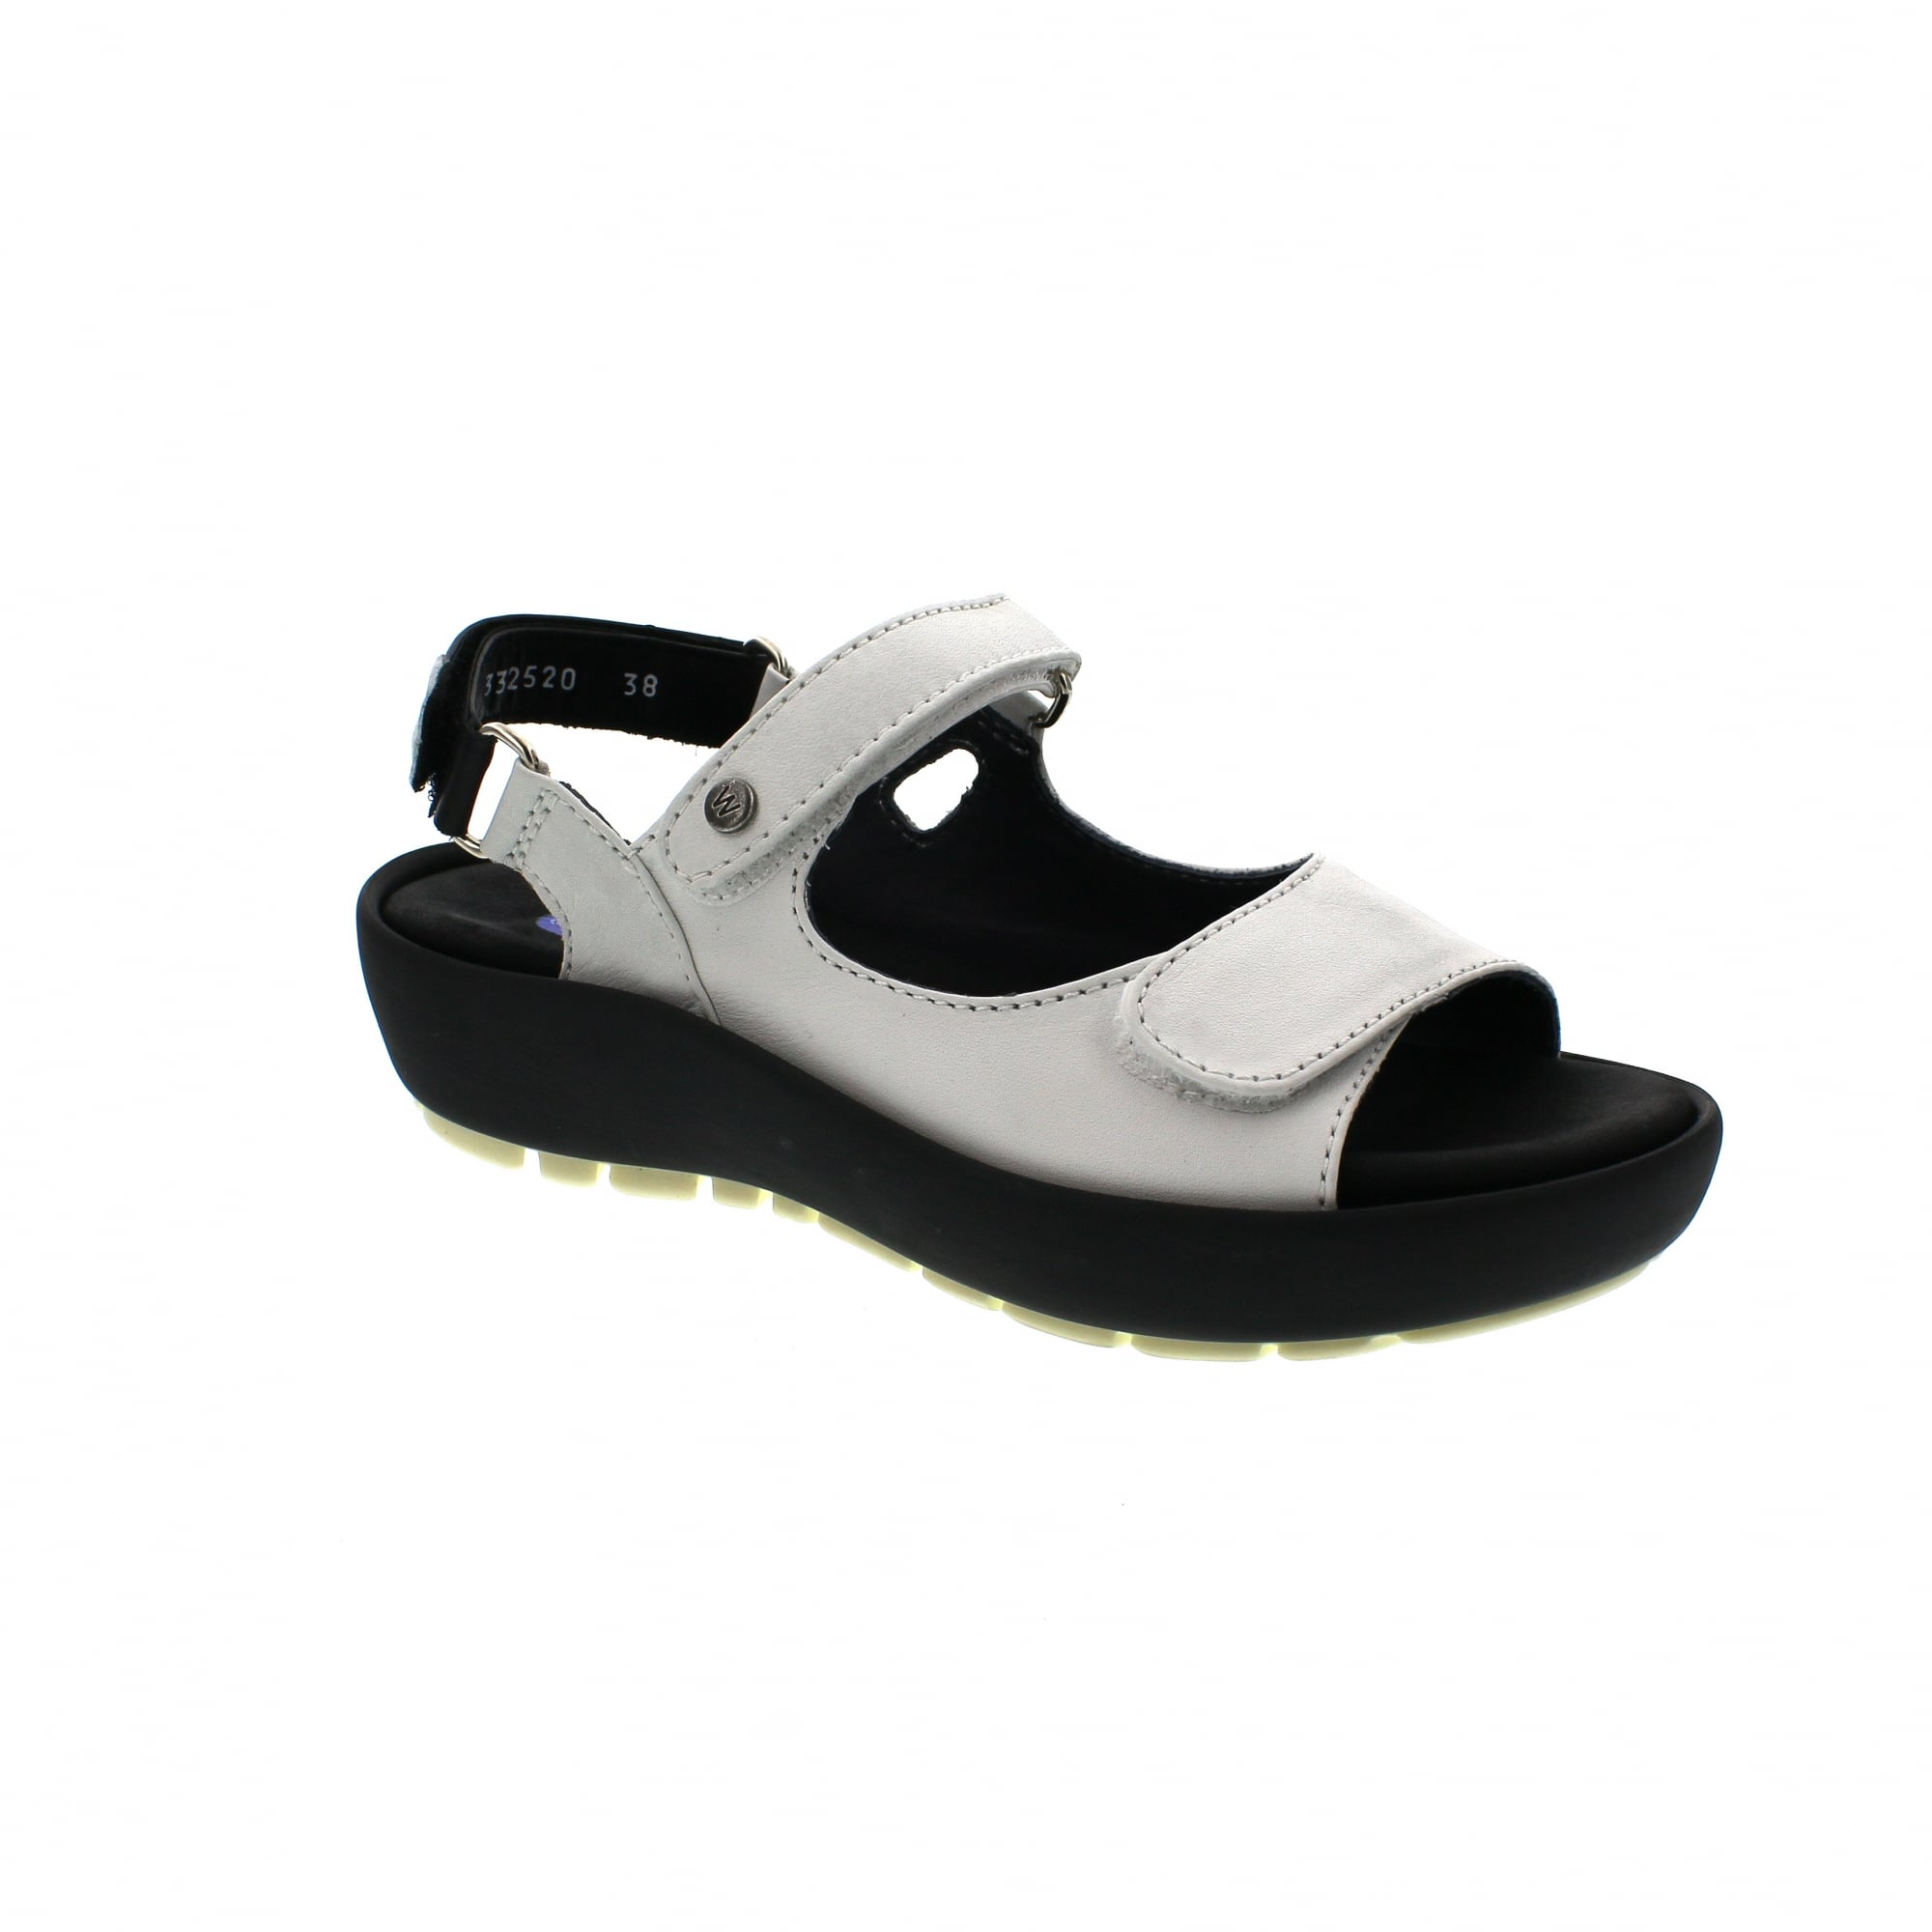 b84126e4e3 Wolky Rio 03325-20-100 Womens Walking Sandals